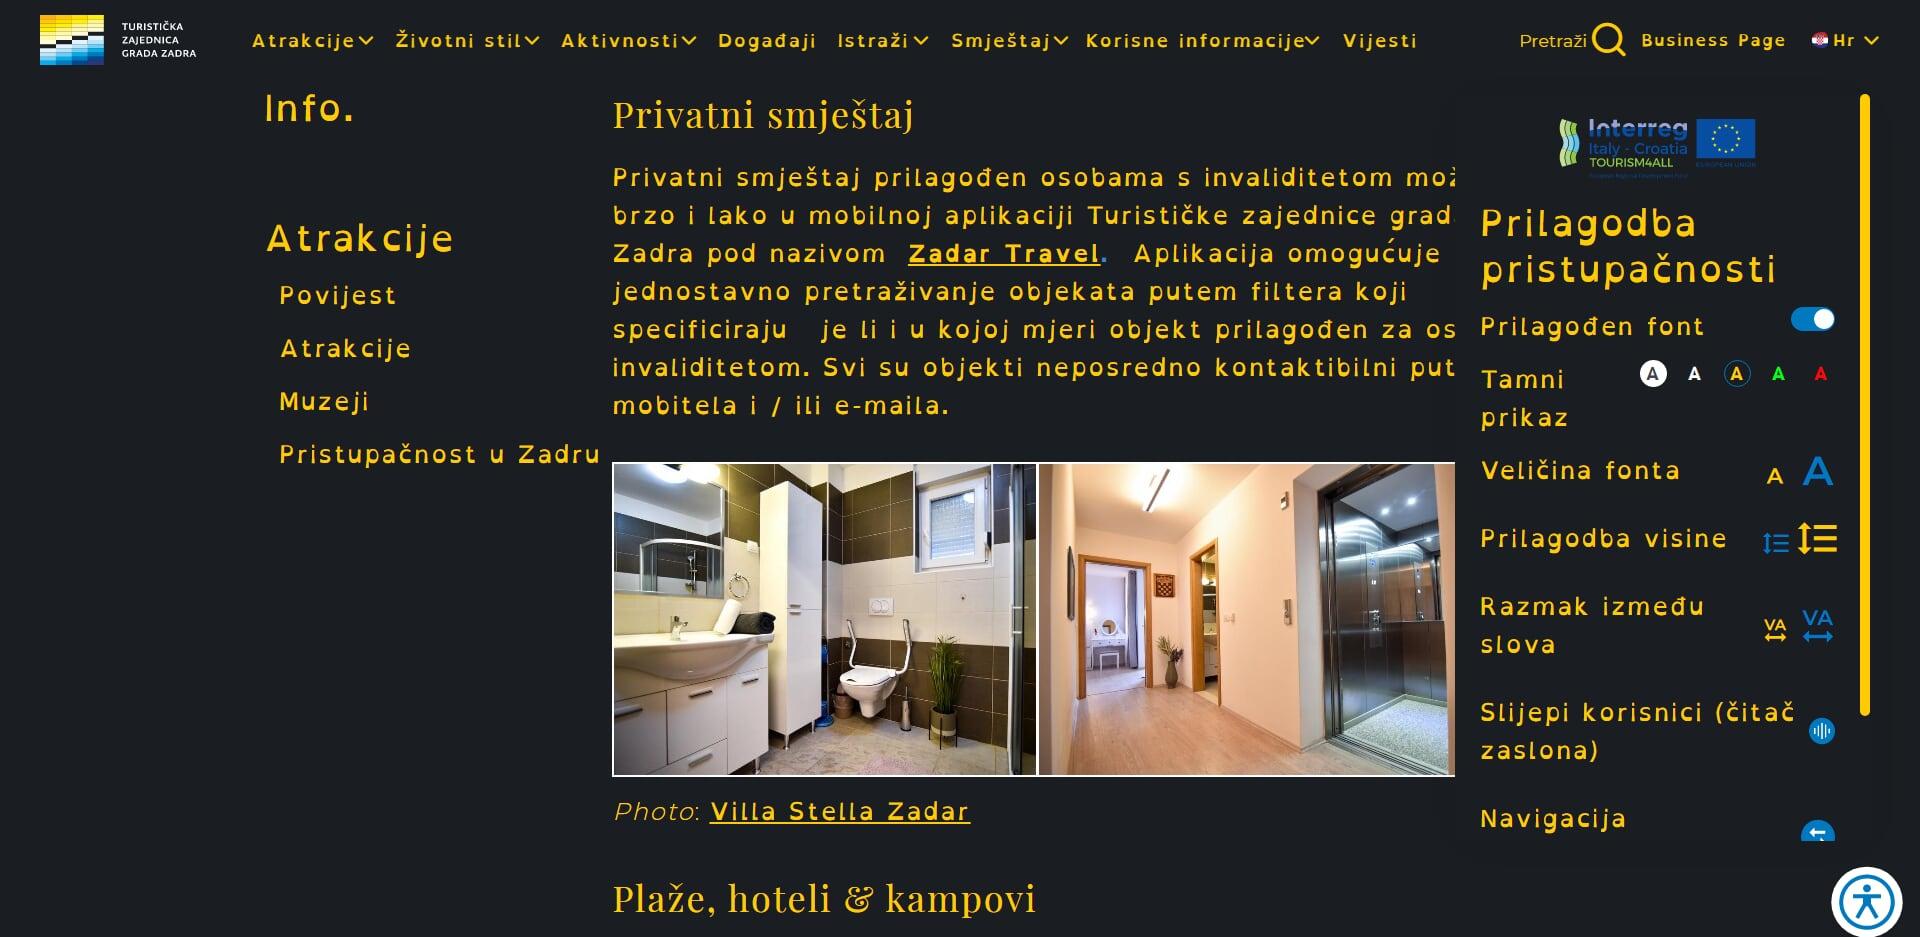 zadar tourist board website